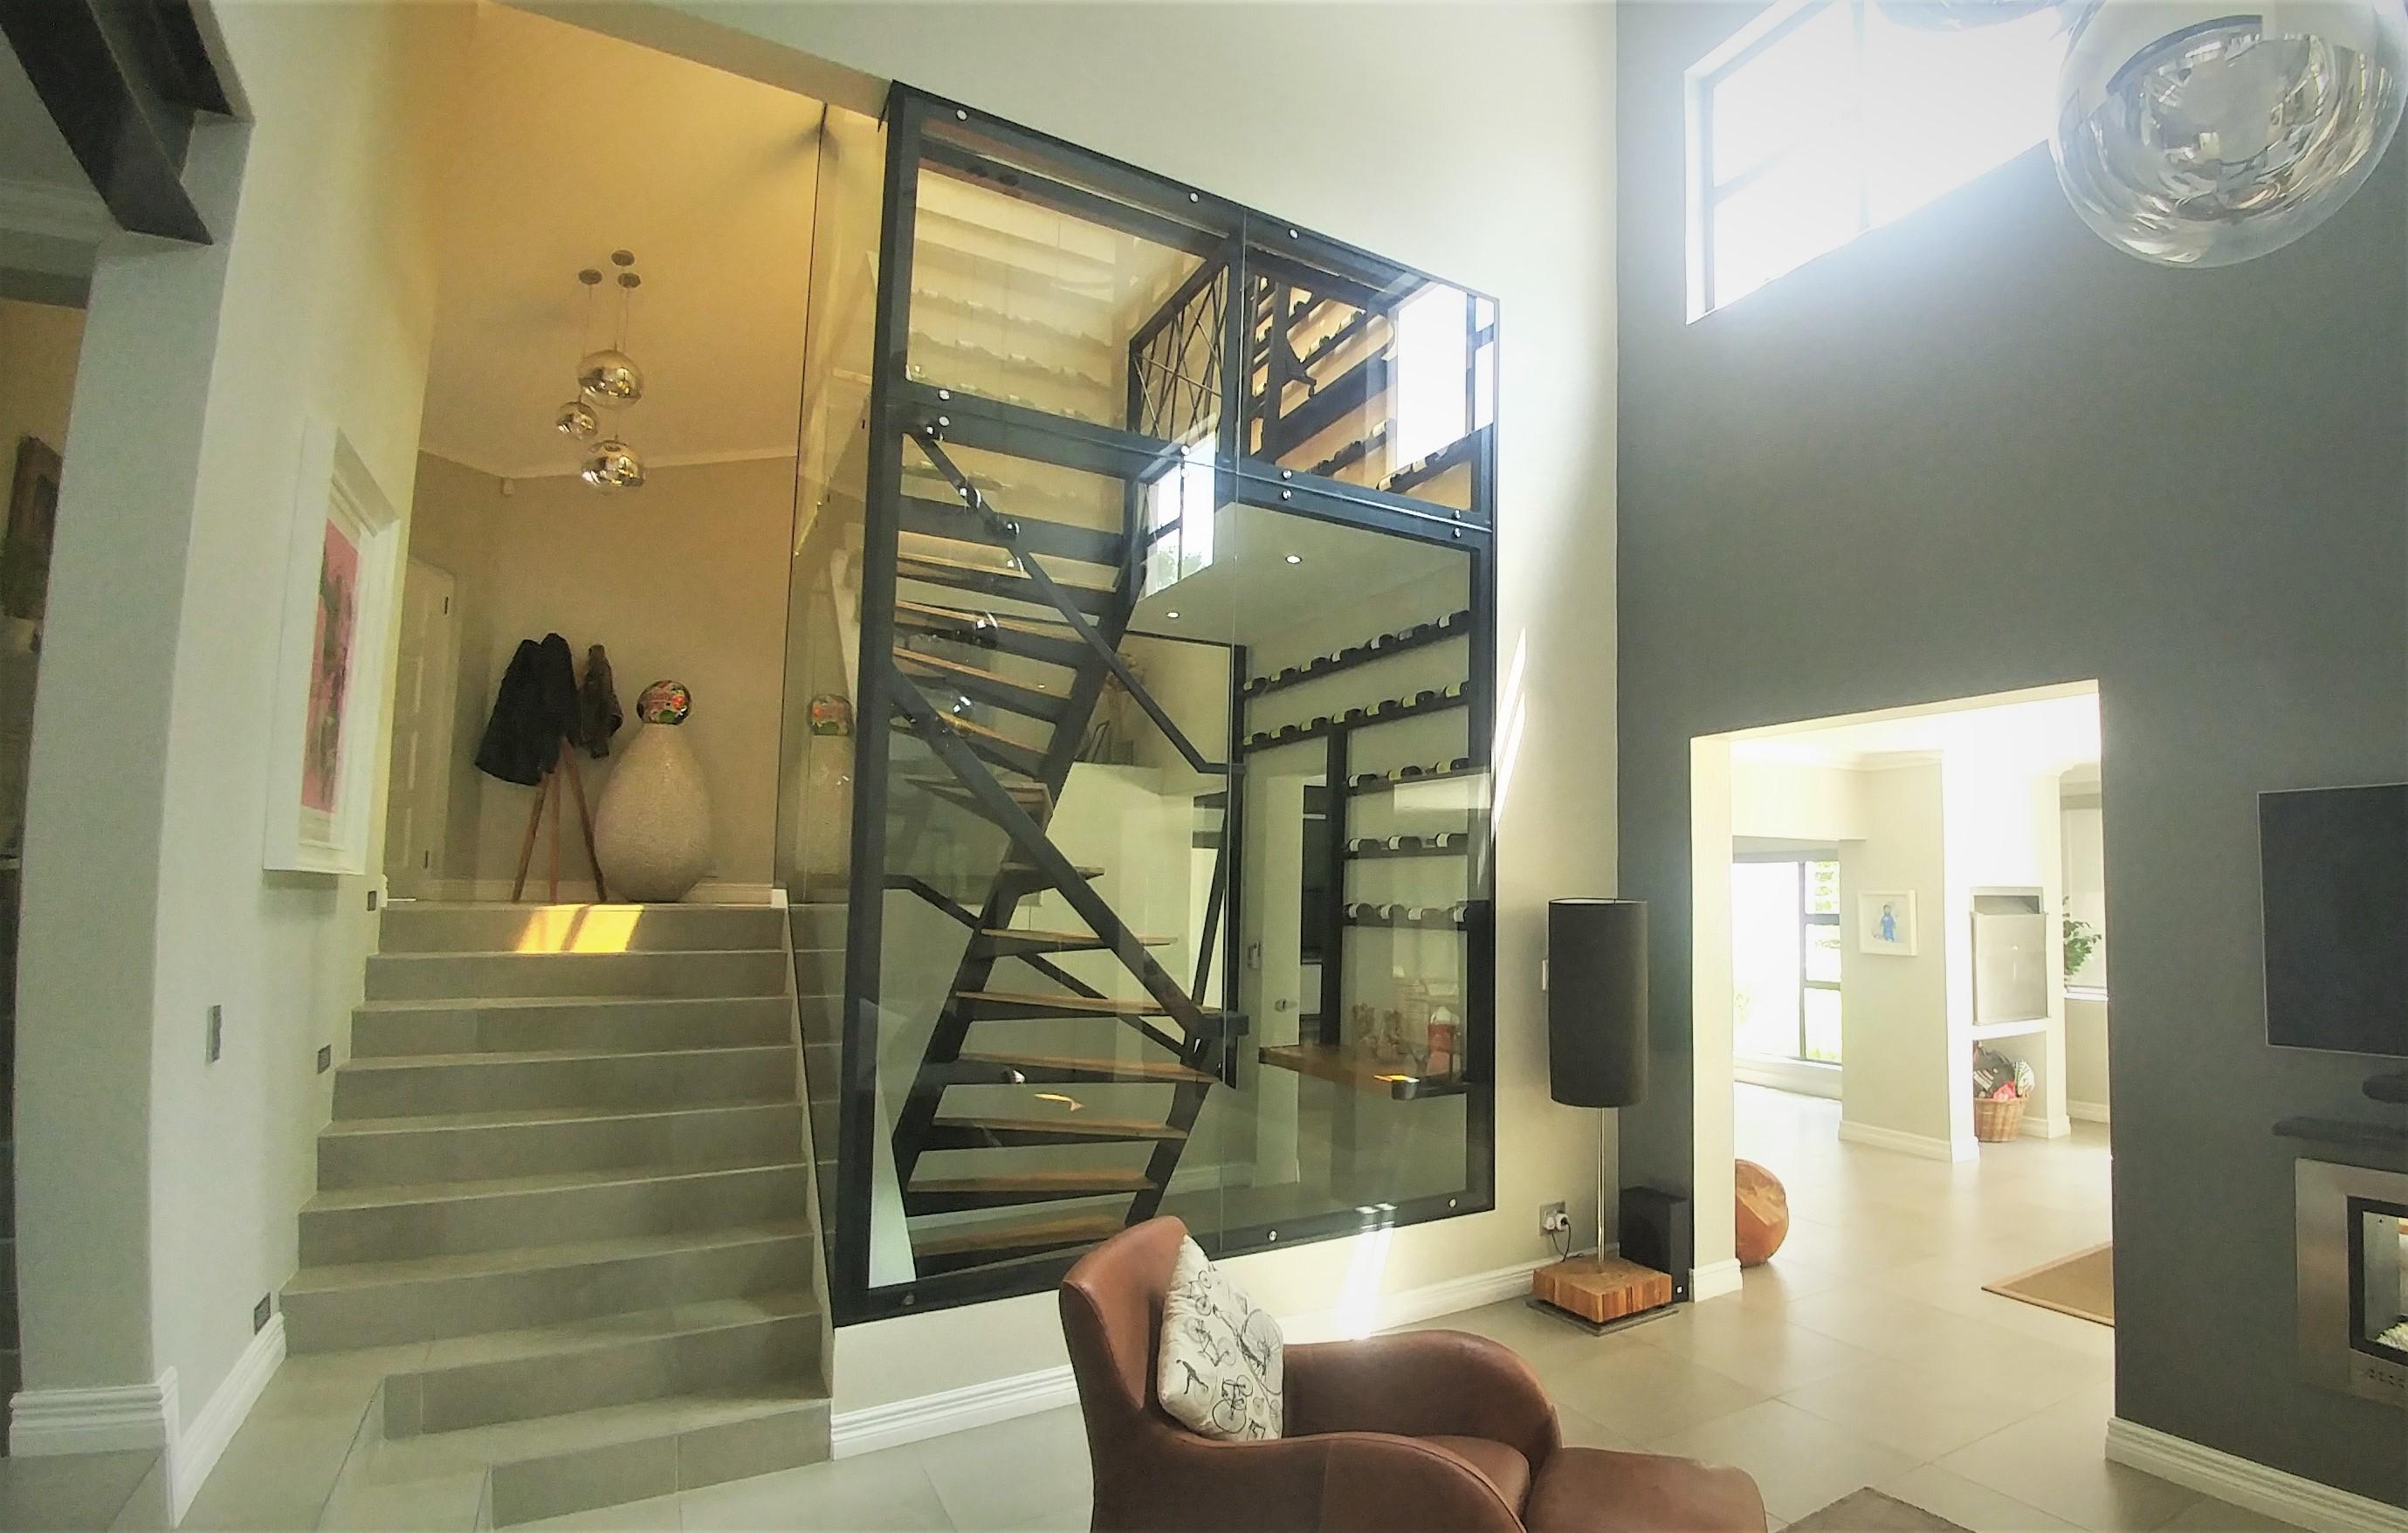 Dann-and-co-glass-wine-cellar